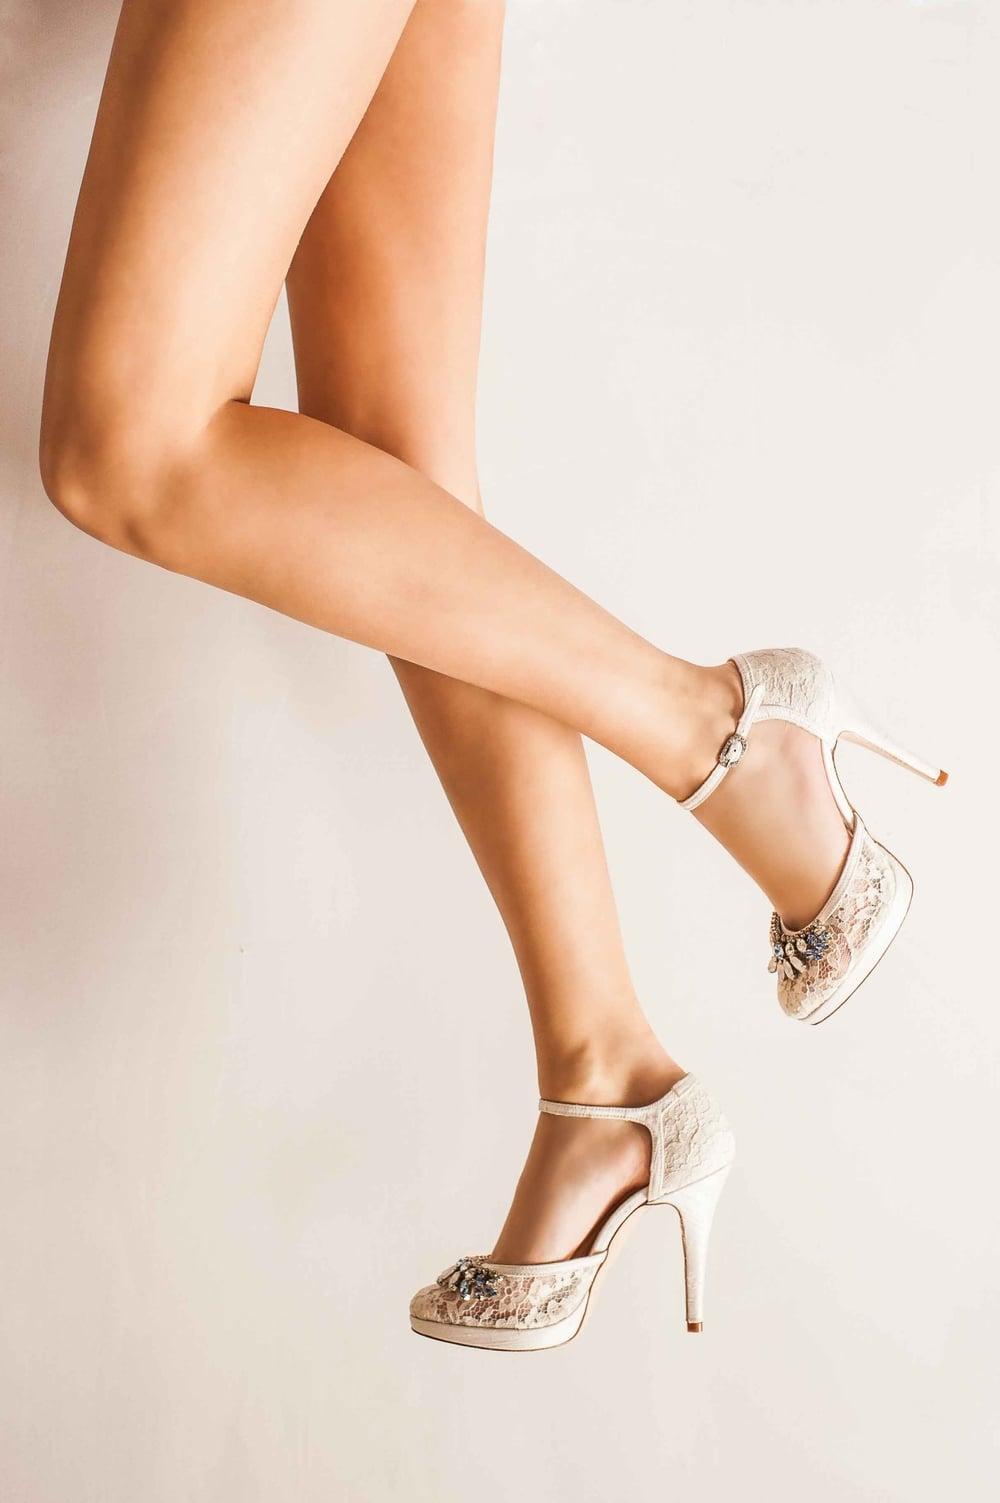 Freya Rose new Legs SM size-11.jpg